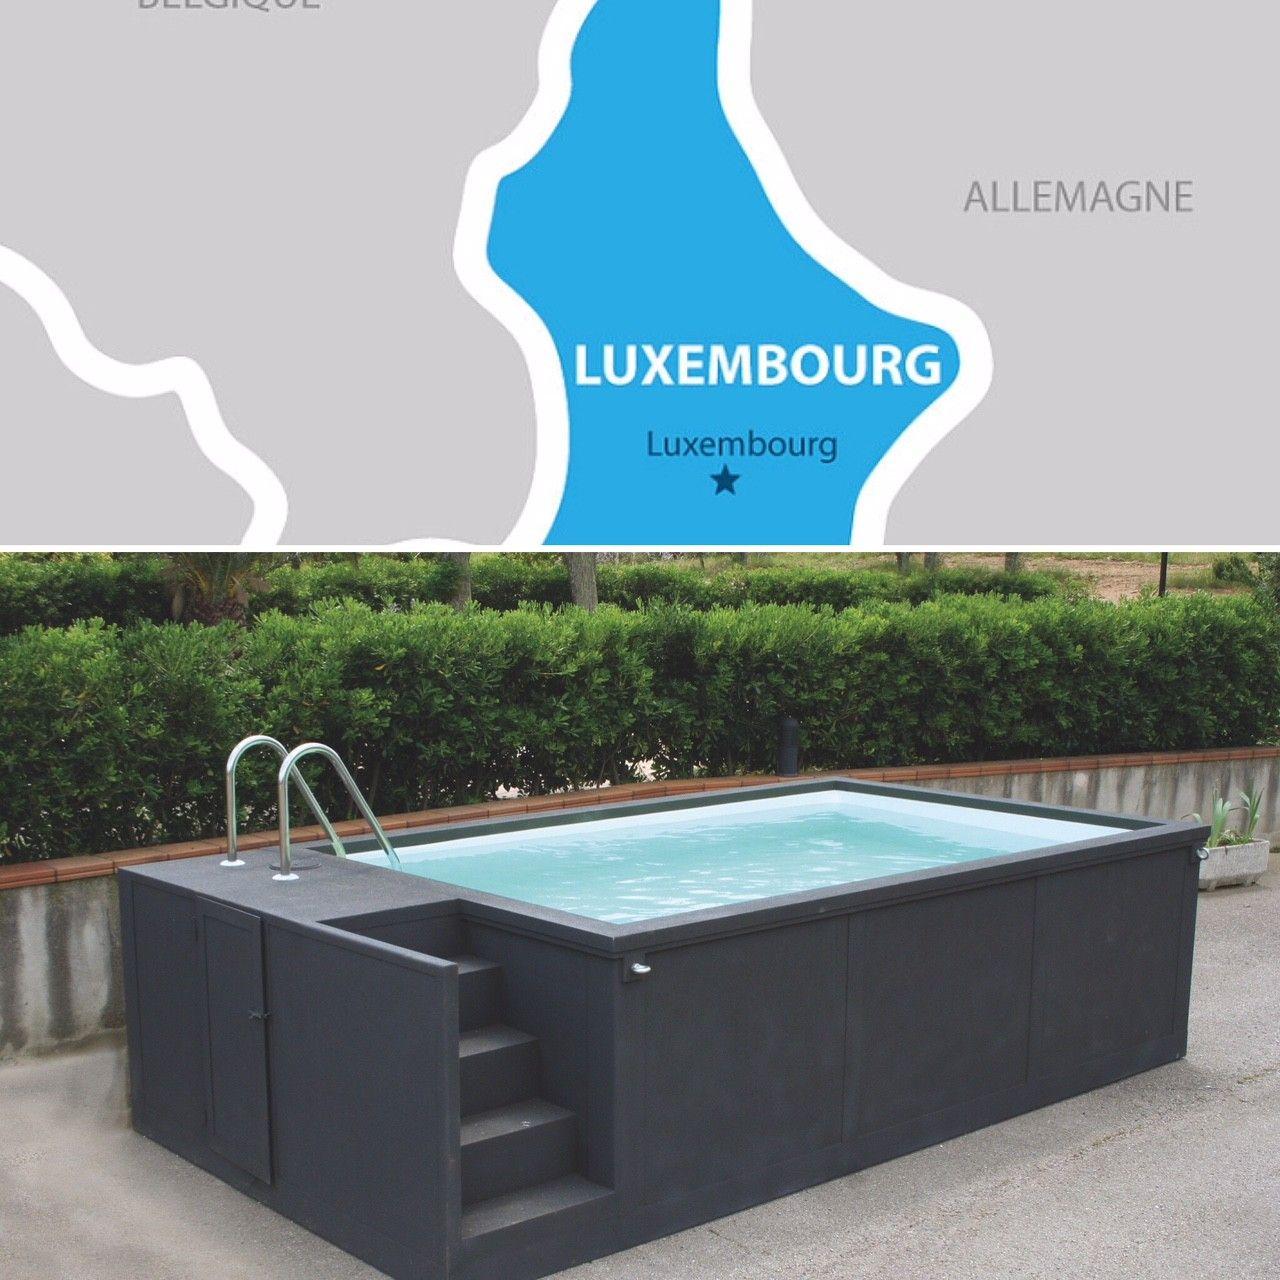 Redange Luxembourg Piscine Container De 20' Container ... concernant Piscine Conteneur